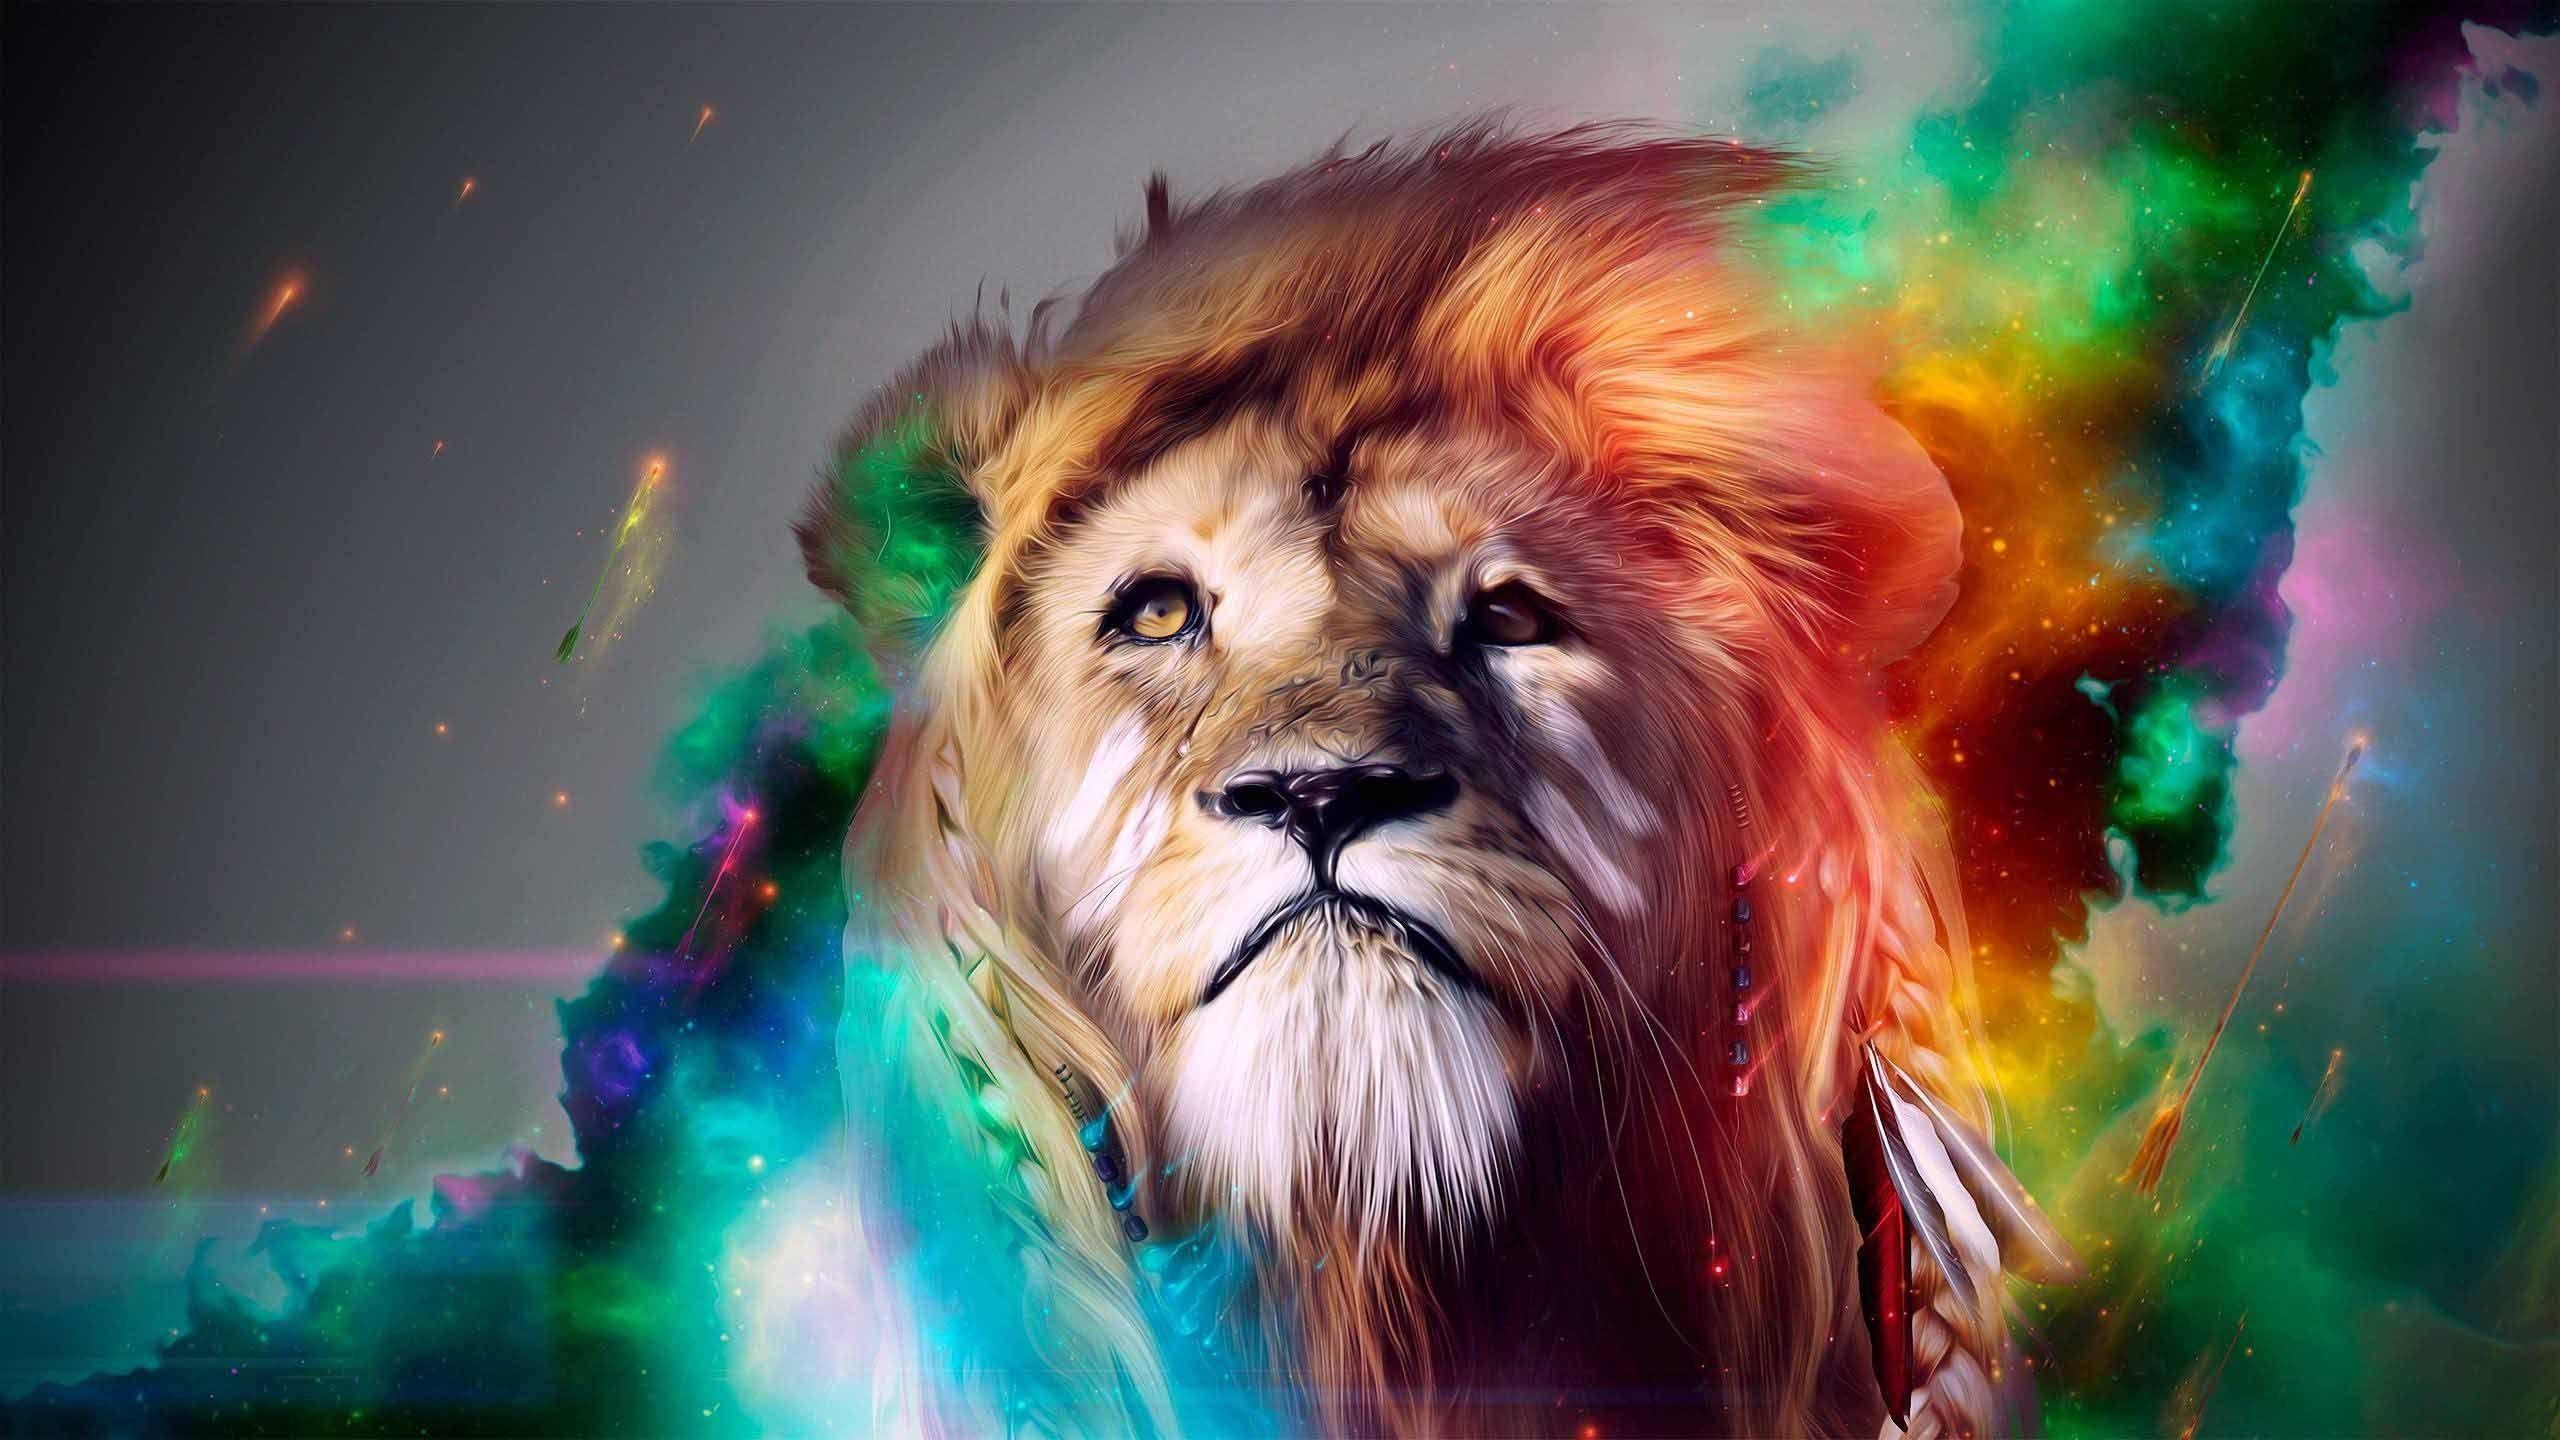 Trippy Lion Wallpaper Hd Ololoshenka Lion Art Wallpaper Lion